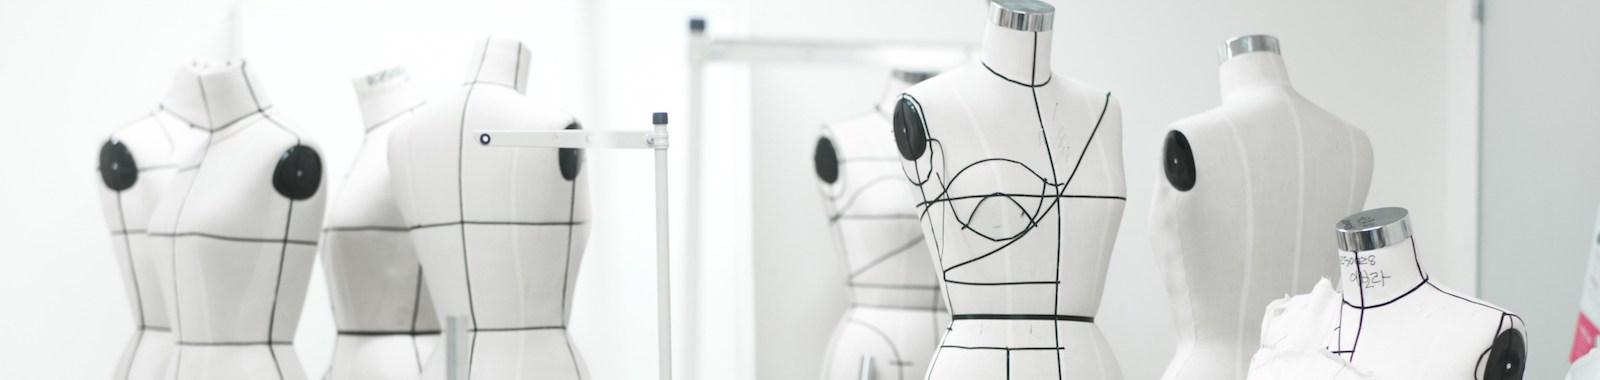 Mannequins in a studio, Seoul, South Korea